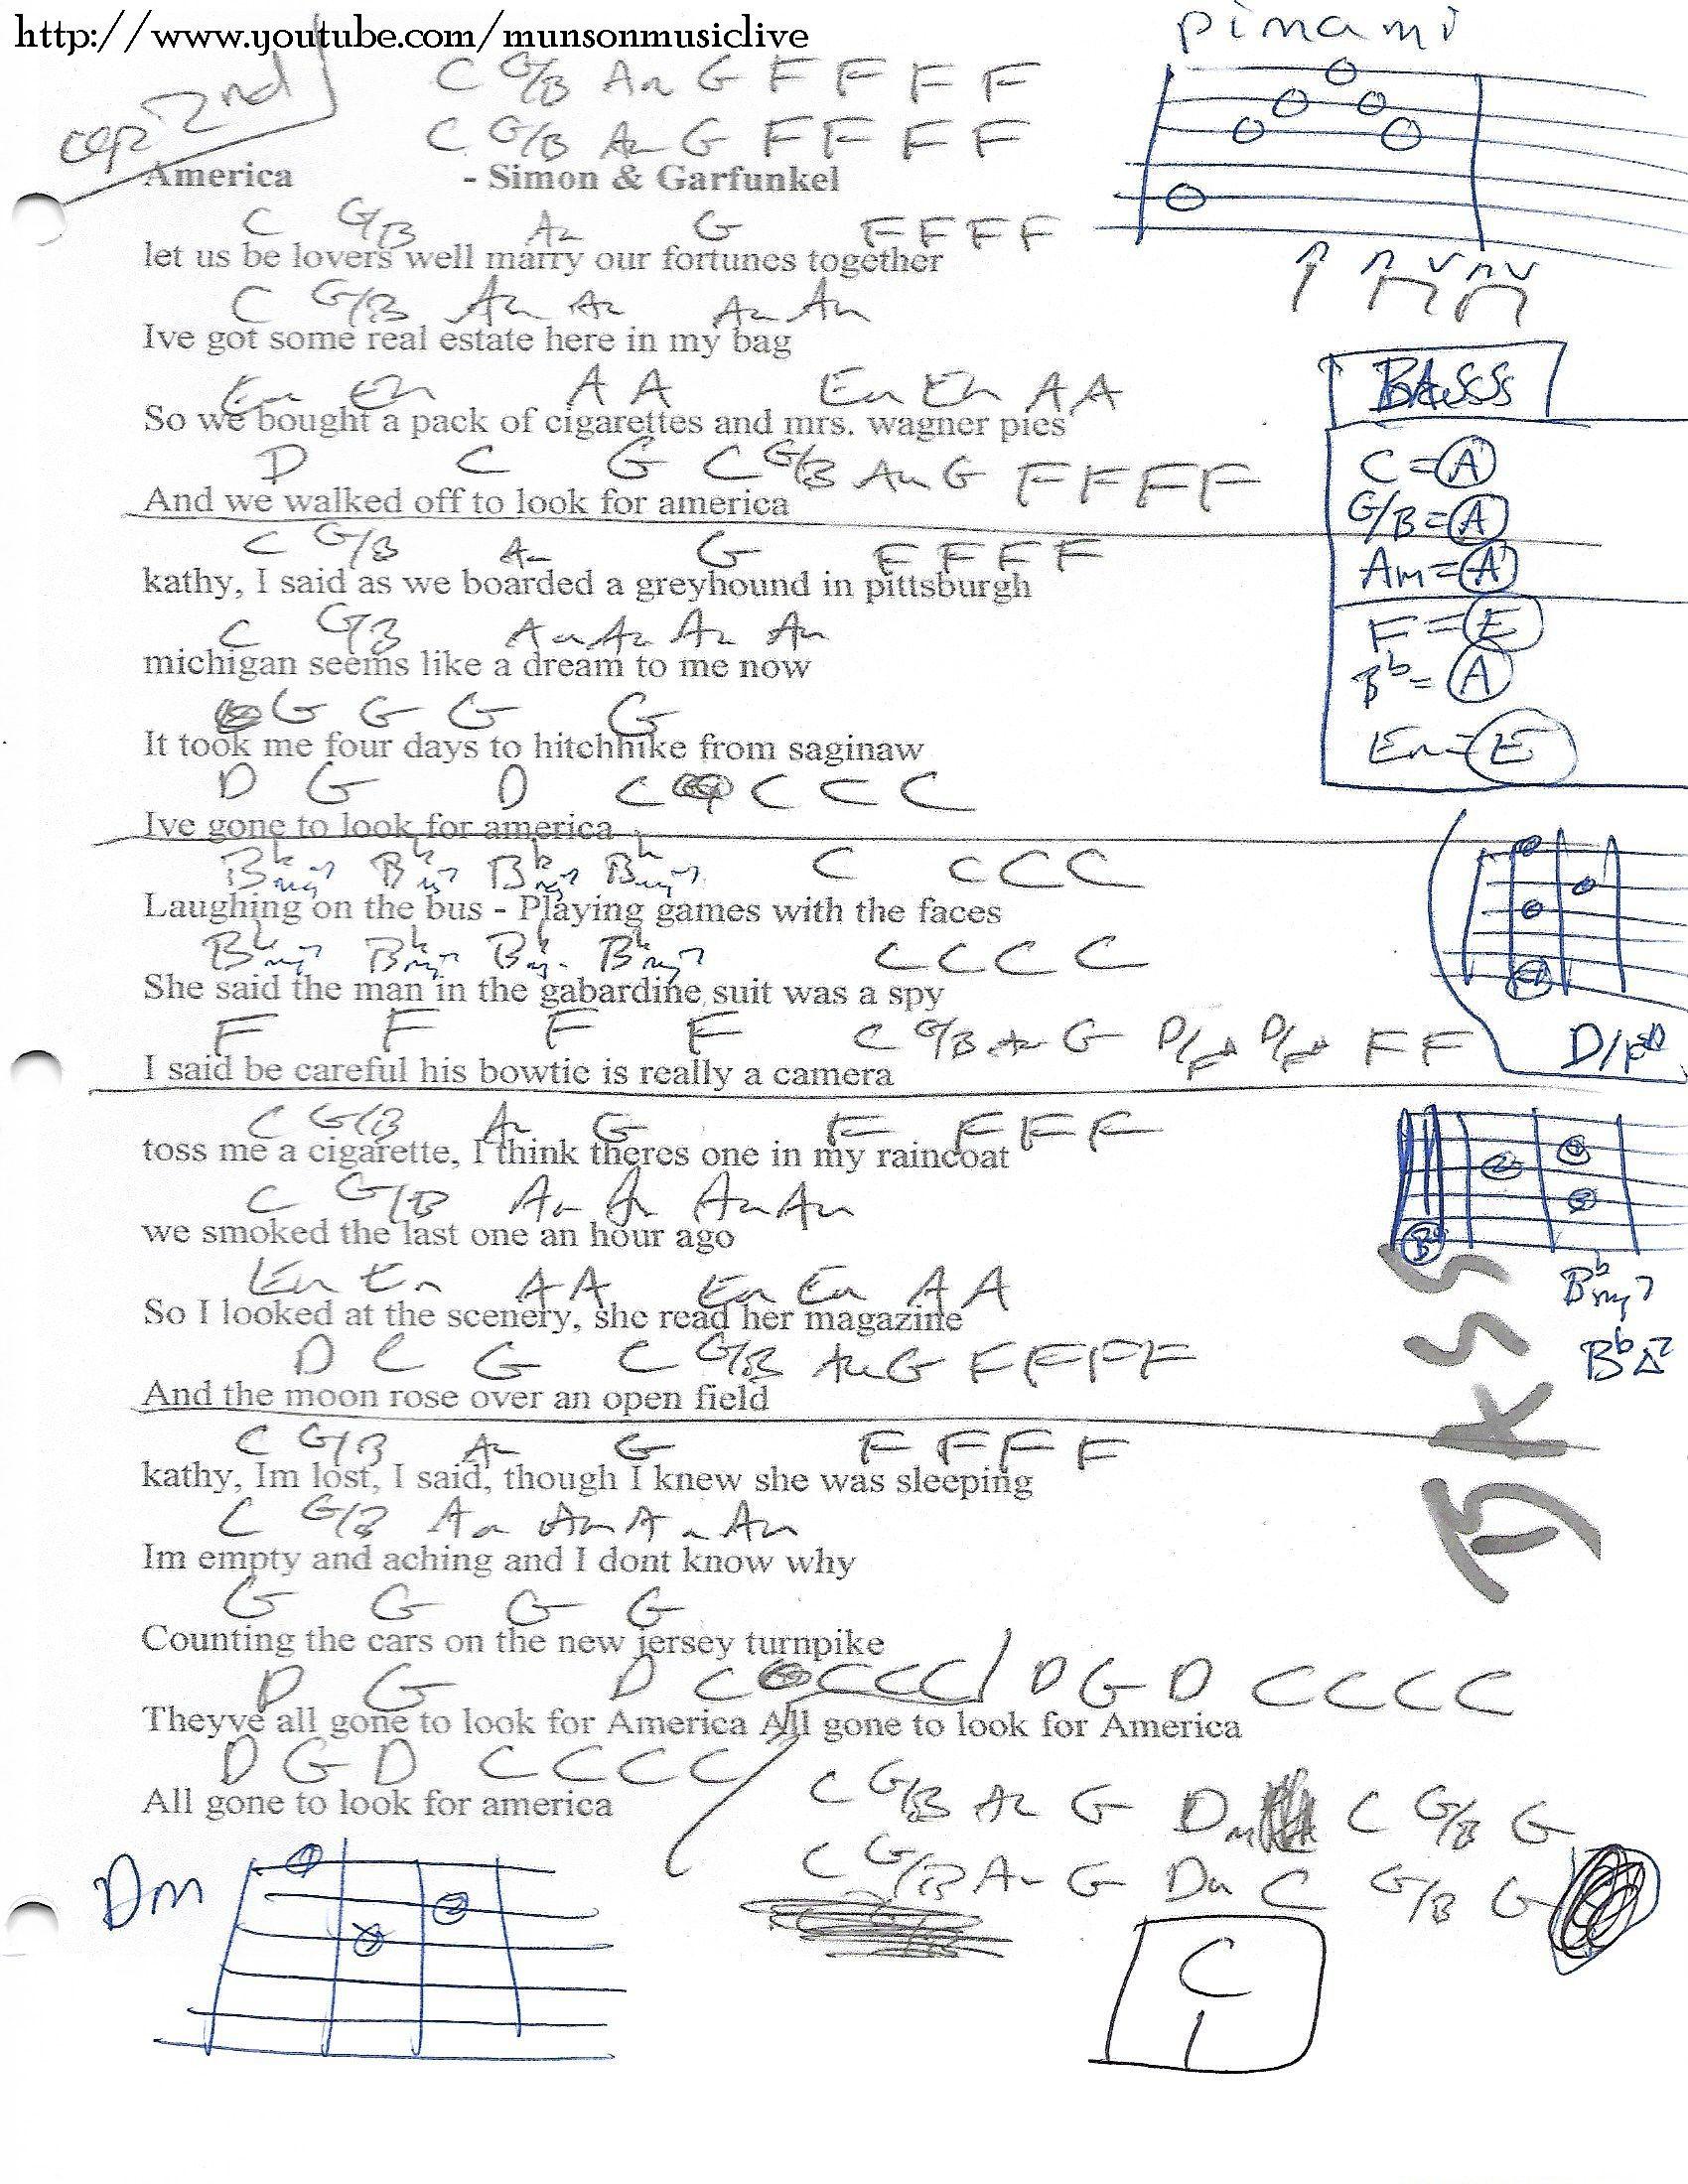 America simon and garfunkel guitar chord chart guitar lesson america simon and garfunkel guitar chord chart hexwebz Images